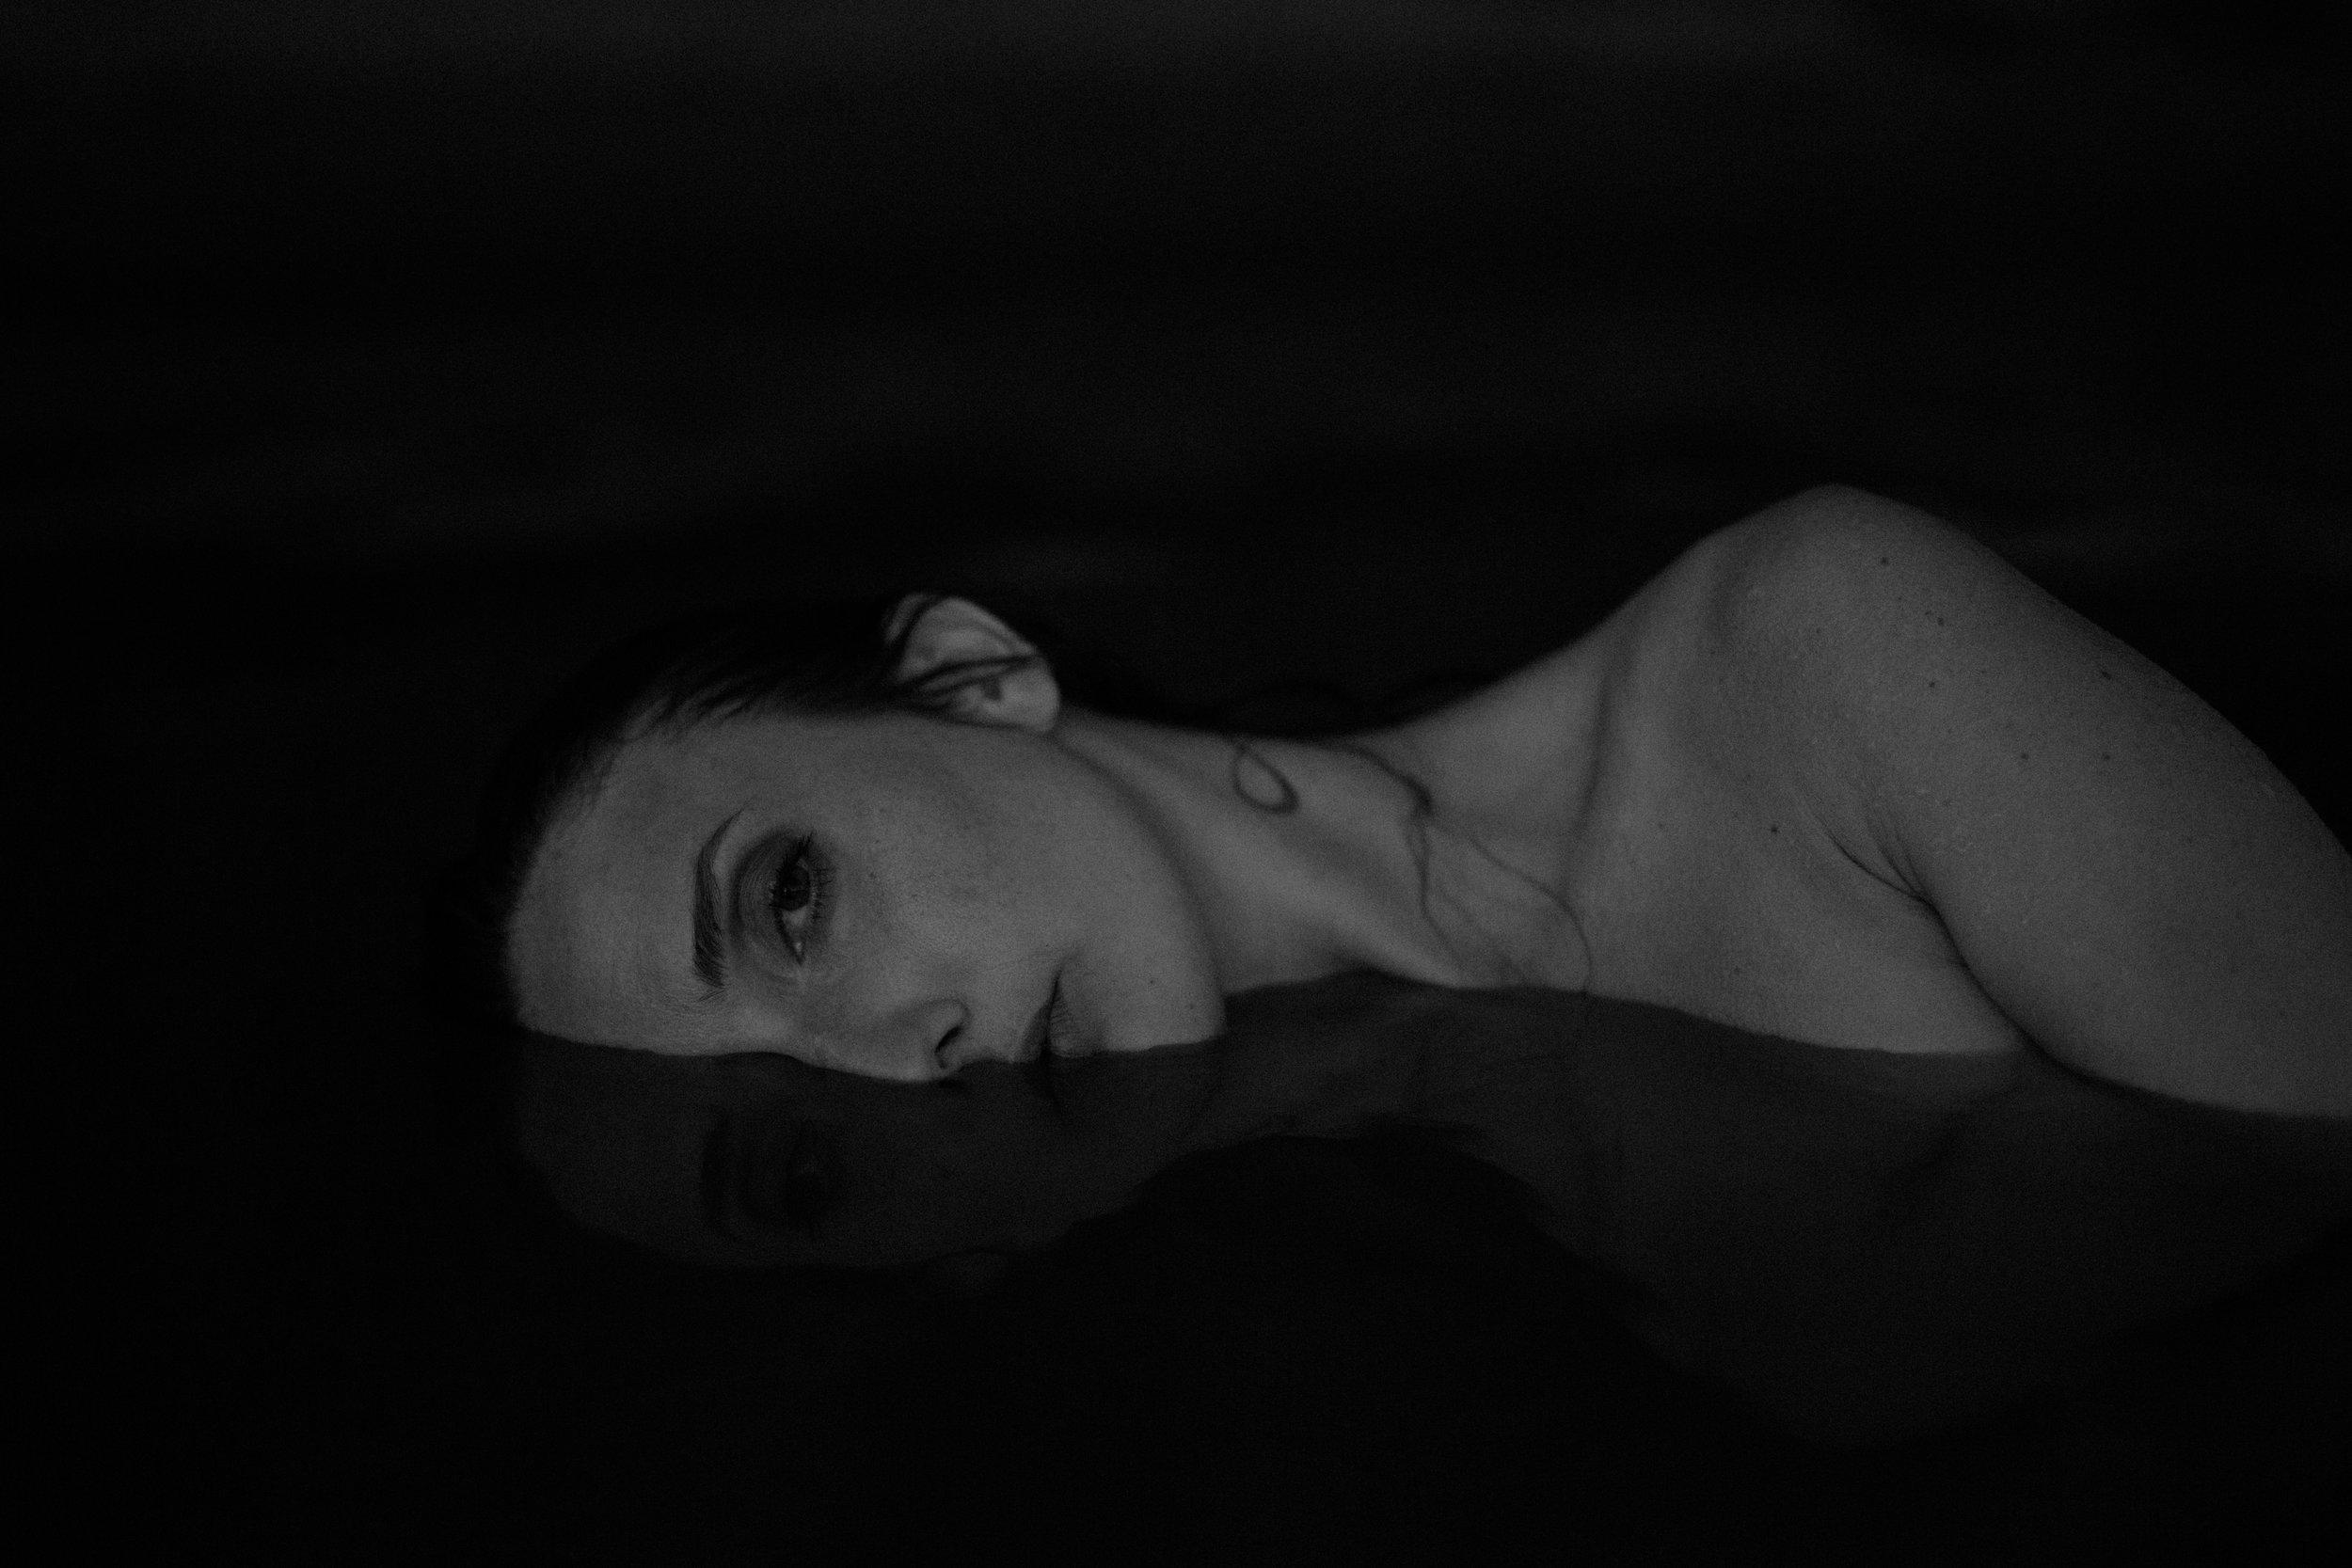 outdoor intimate portrait. black and white. boudoir inspiration. underwater nude. underwater boudoir. art model. anoushanou. ohio boudoir photographer. sarah rose photography. i am sarah rose.